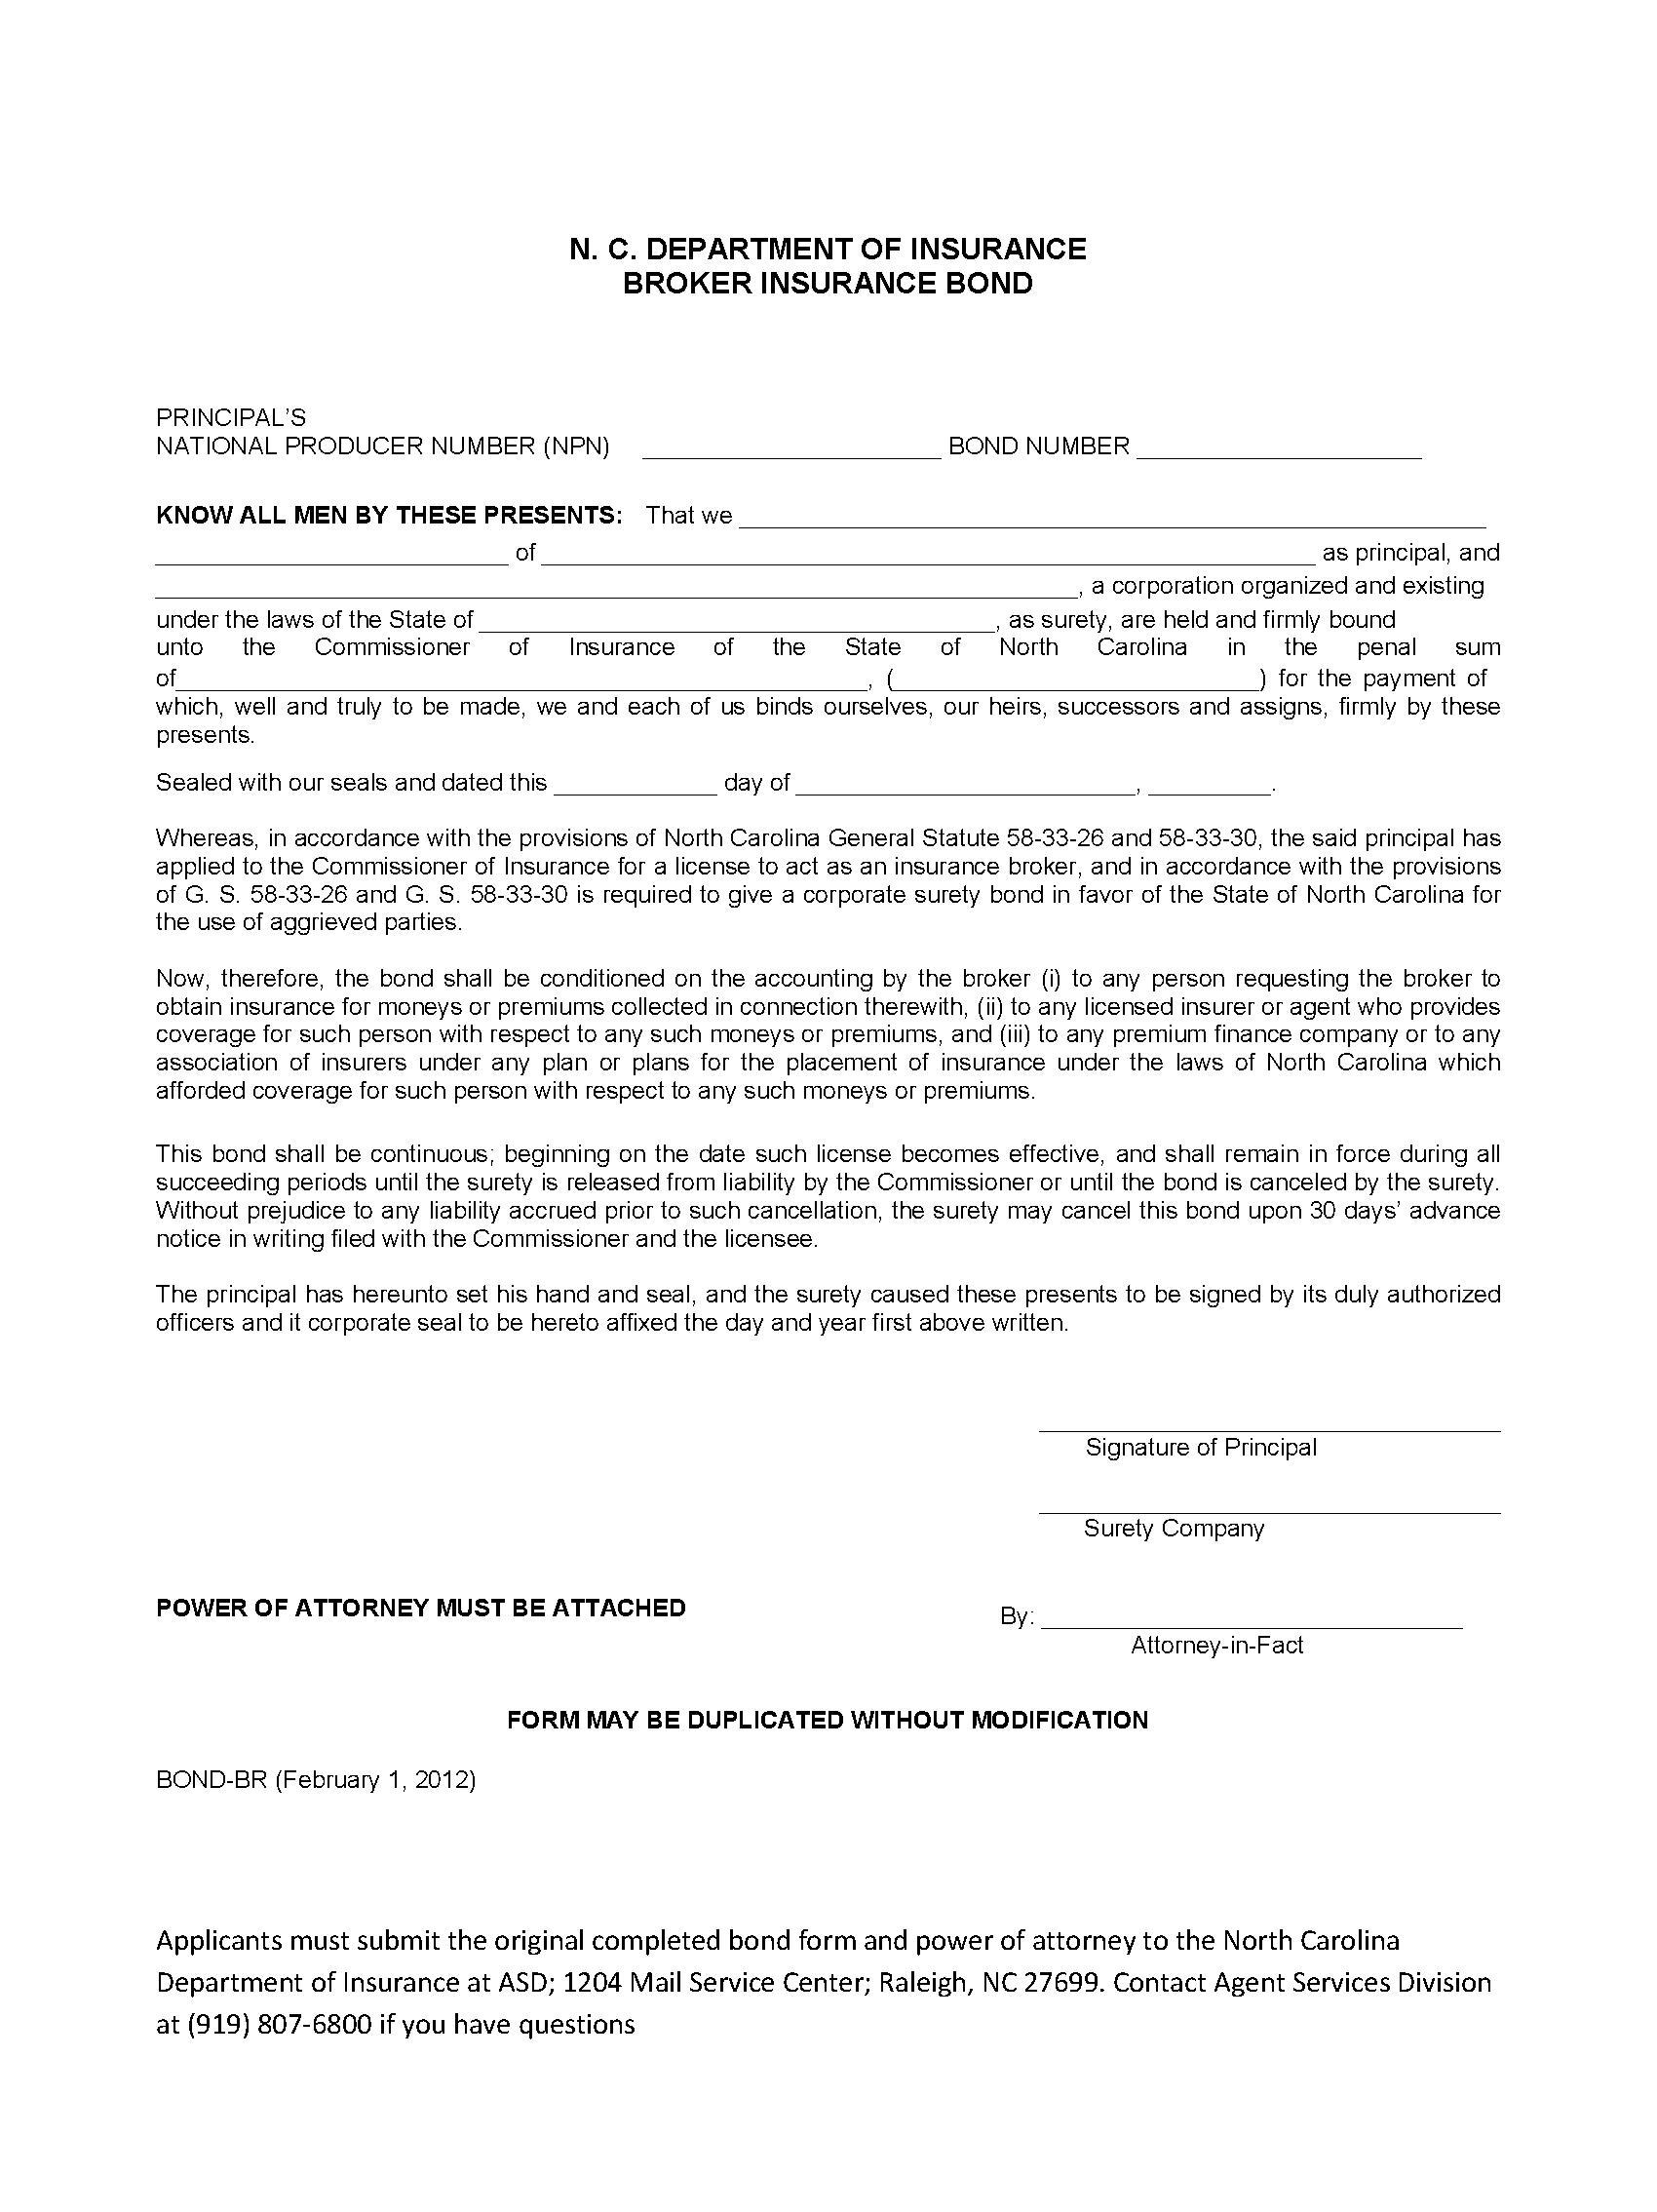 State of North Carolina Insurance Broker sample image